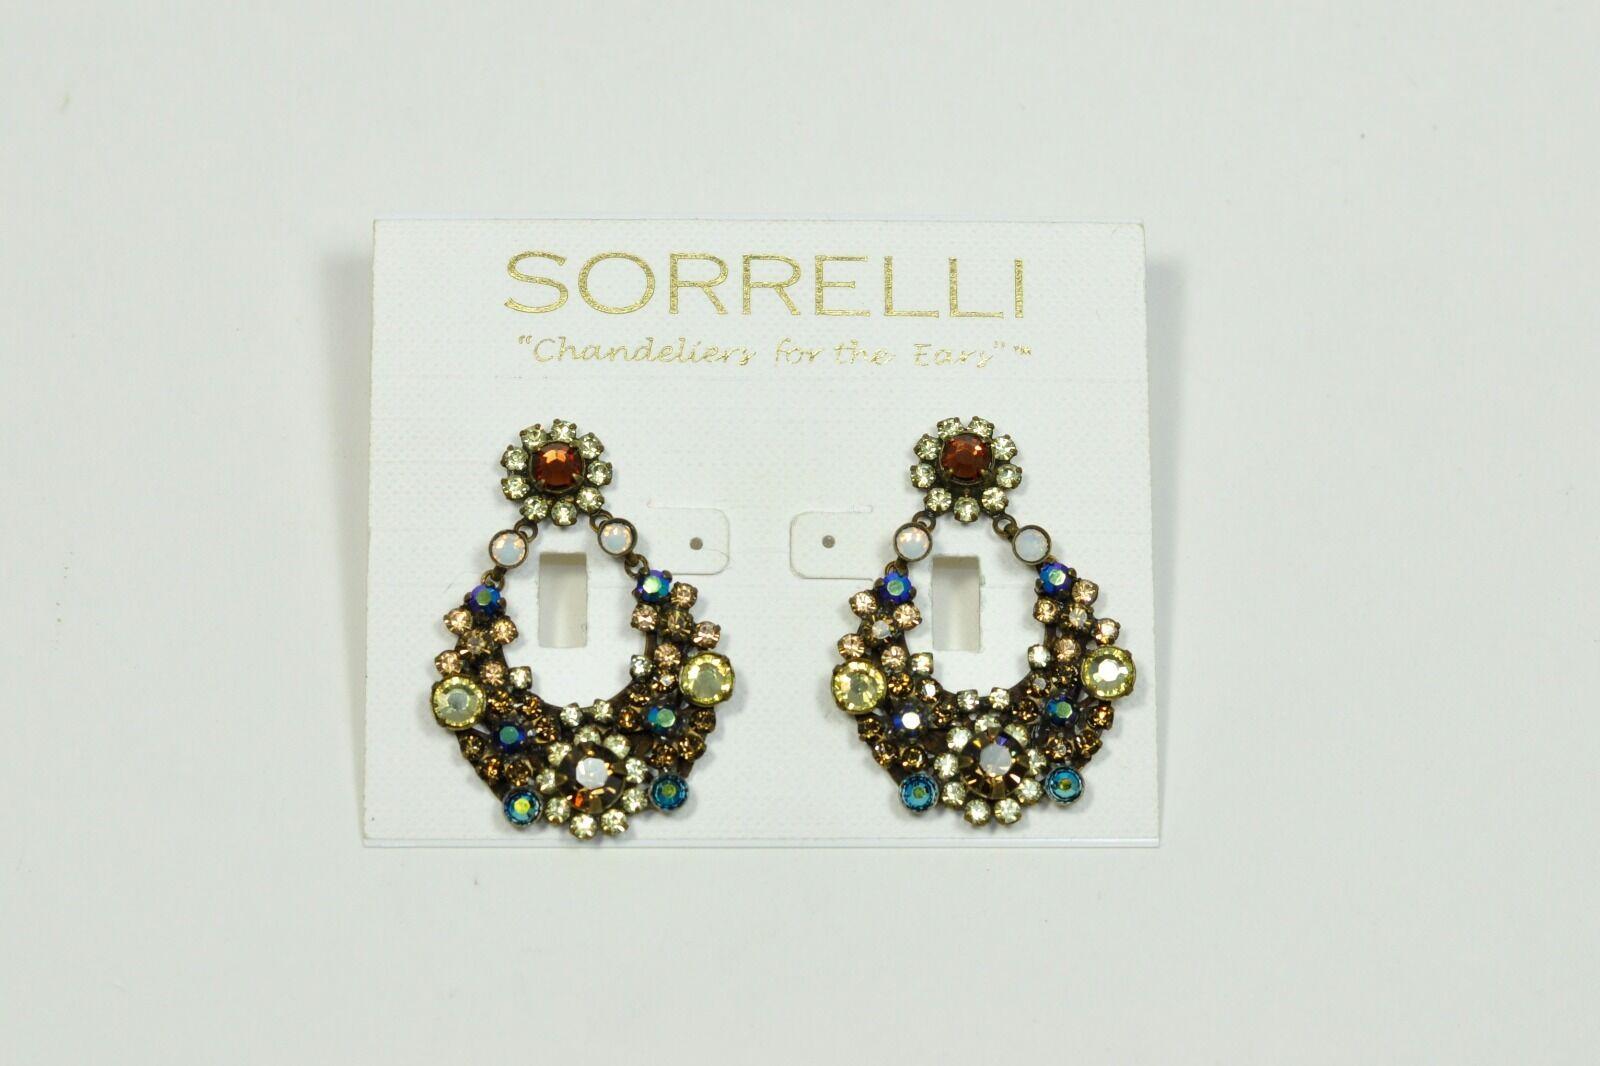 Sorrelli Chandeliers Iced Coffee Topaz Crystal Dangling Drop Post Earrings NWT